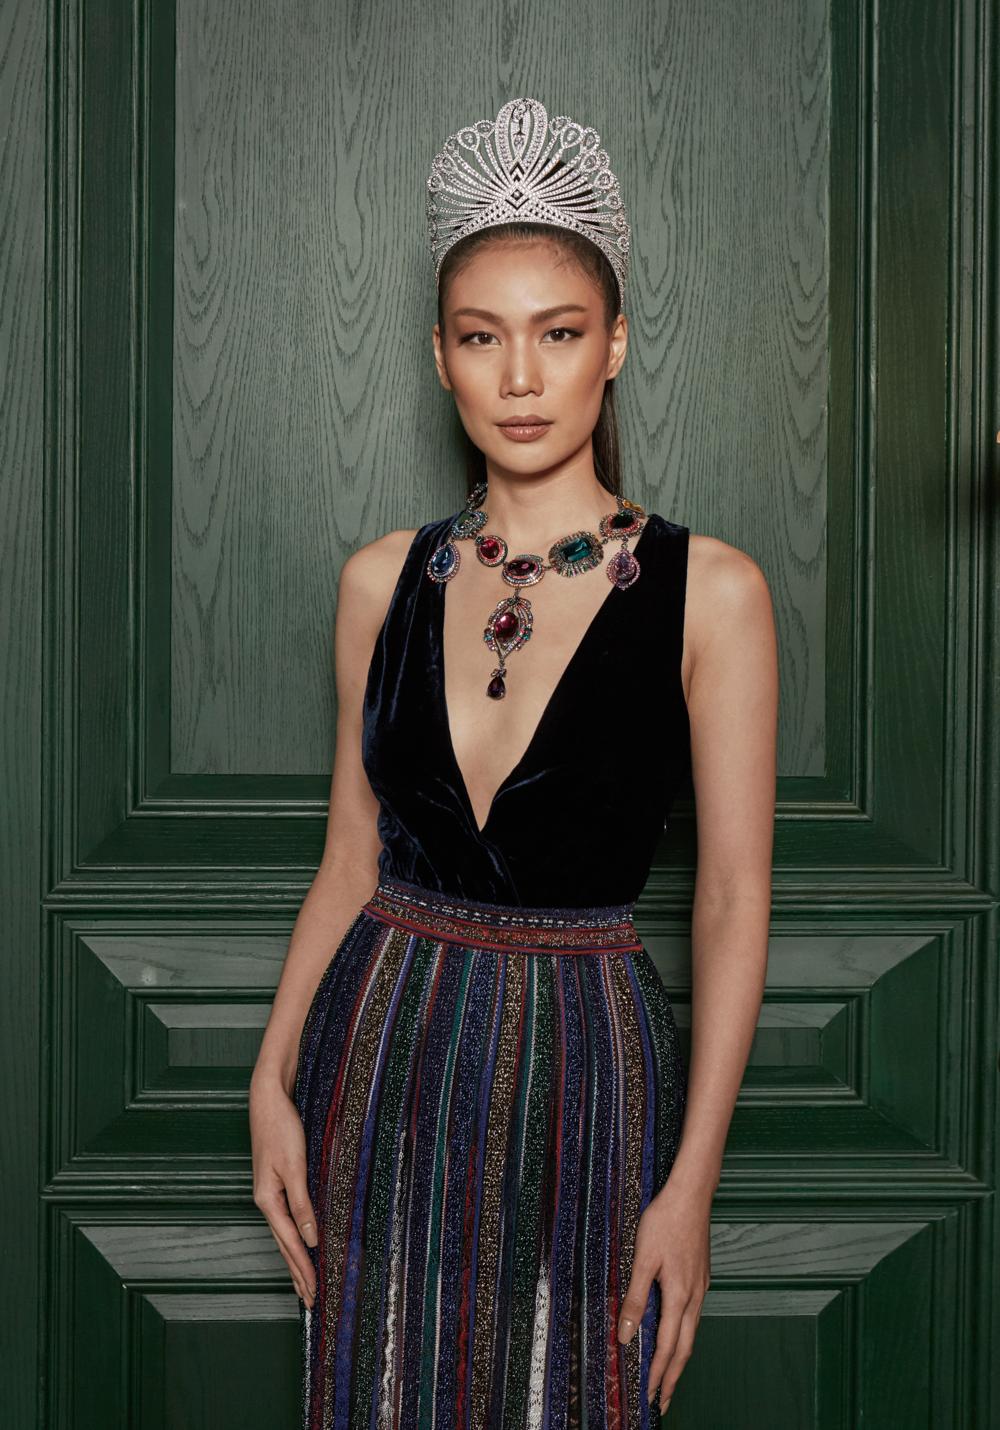 clothes : MISSONI / necklace : Butler & Wilson LONDON